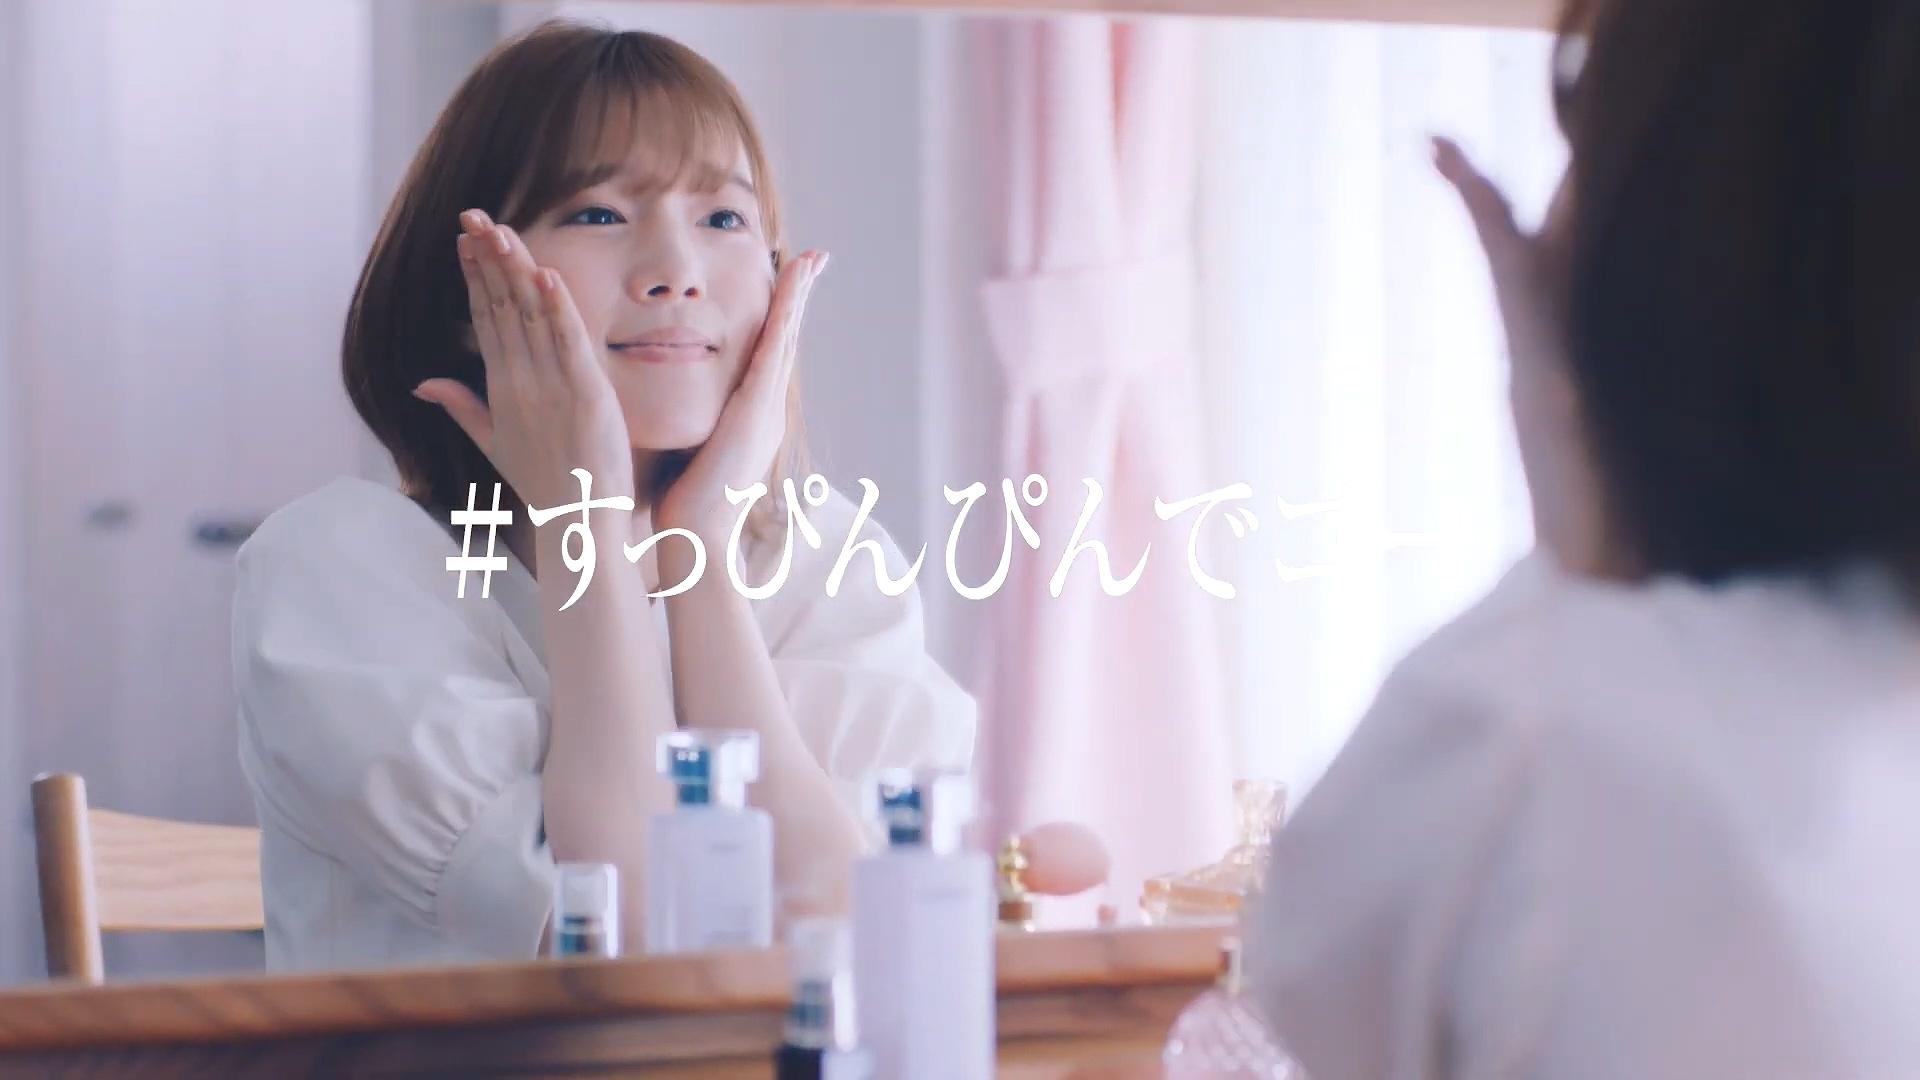 内田真礼 HABA SQUALANE 美容油 广告